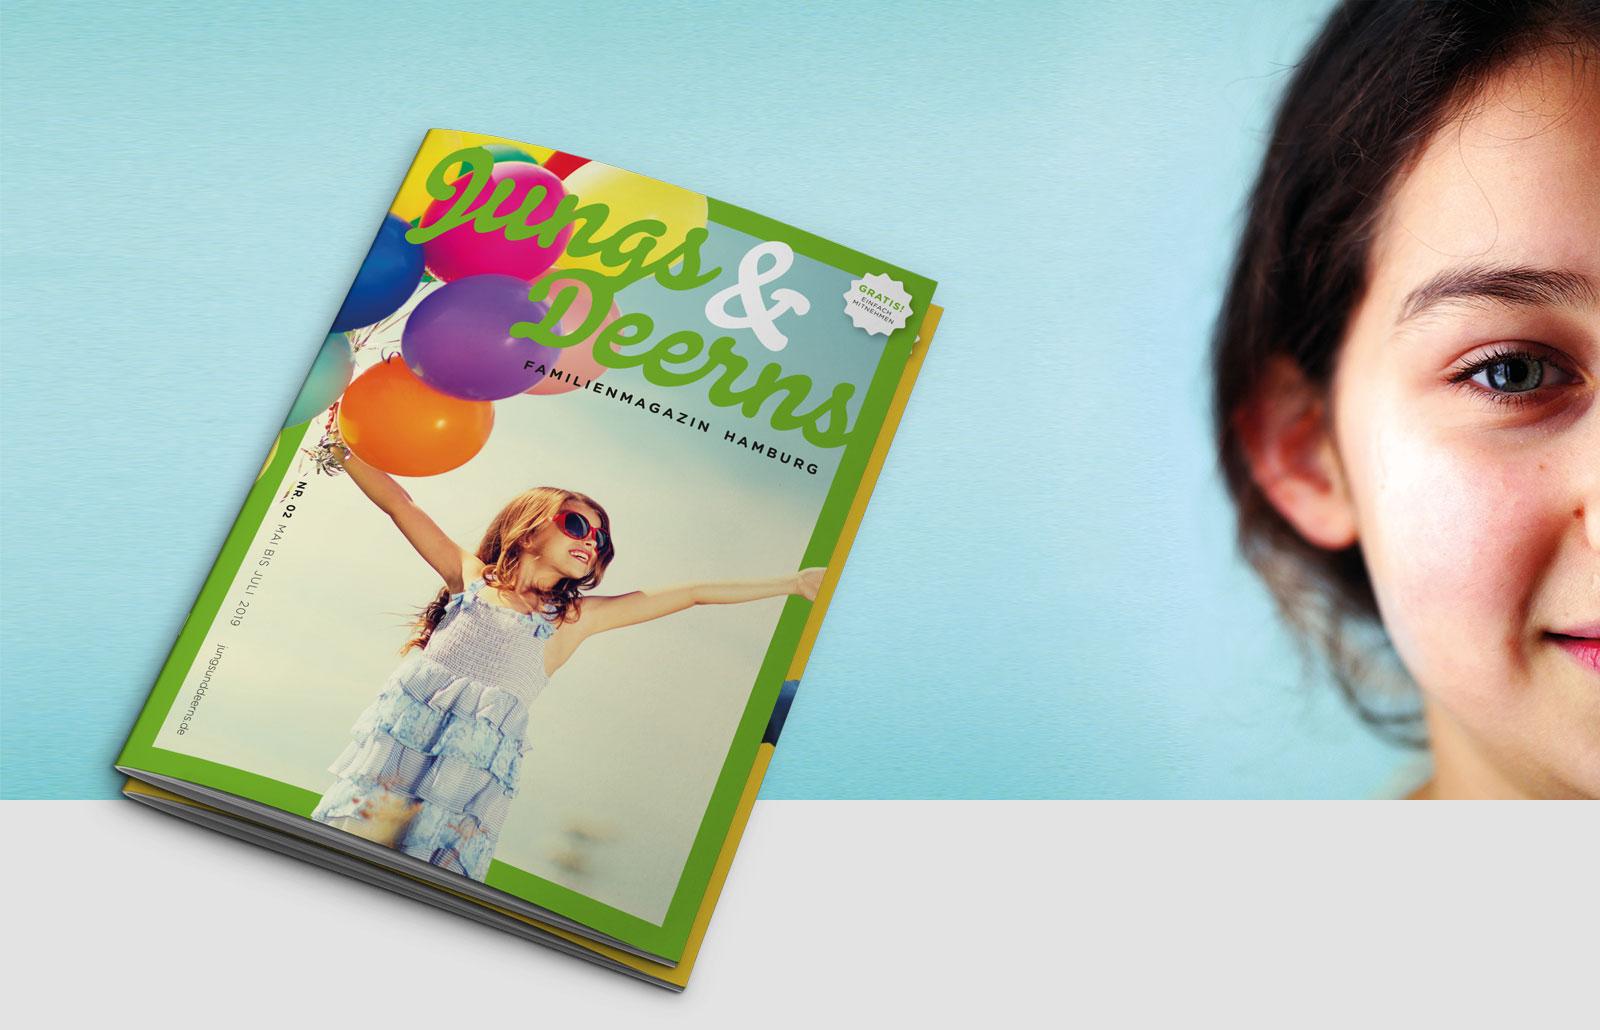 Jungs & Deerns Familienmagazin Hamburg